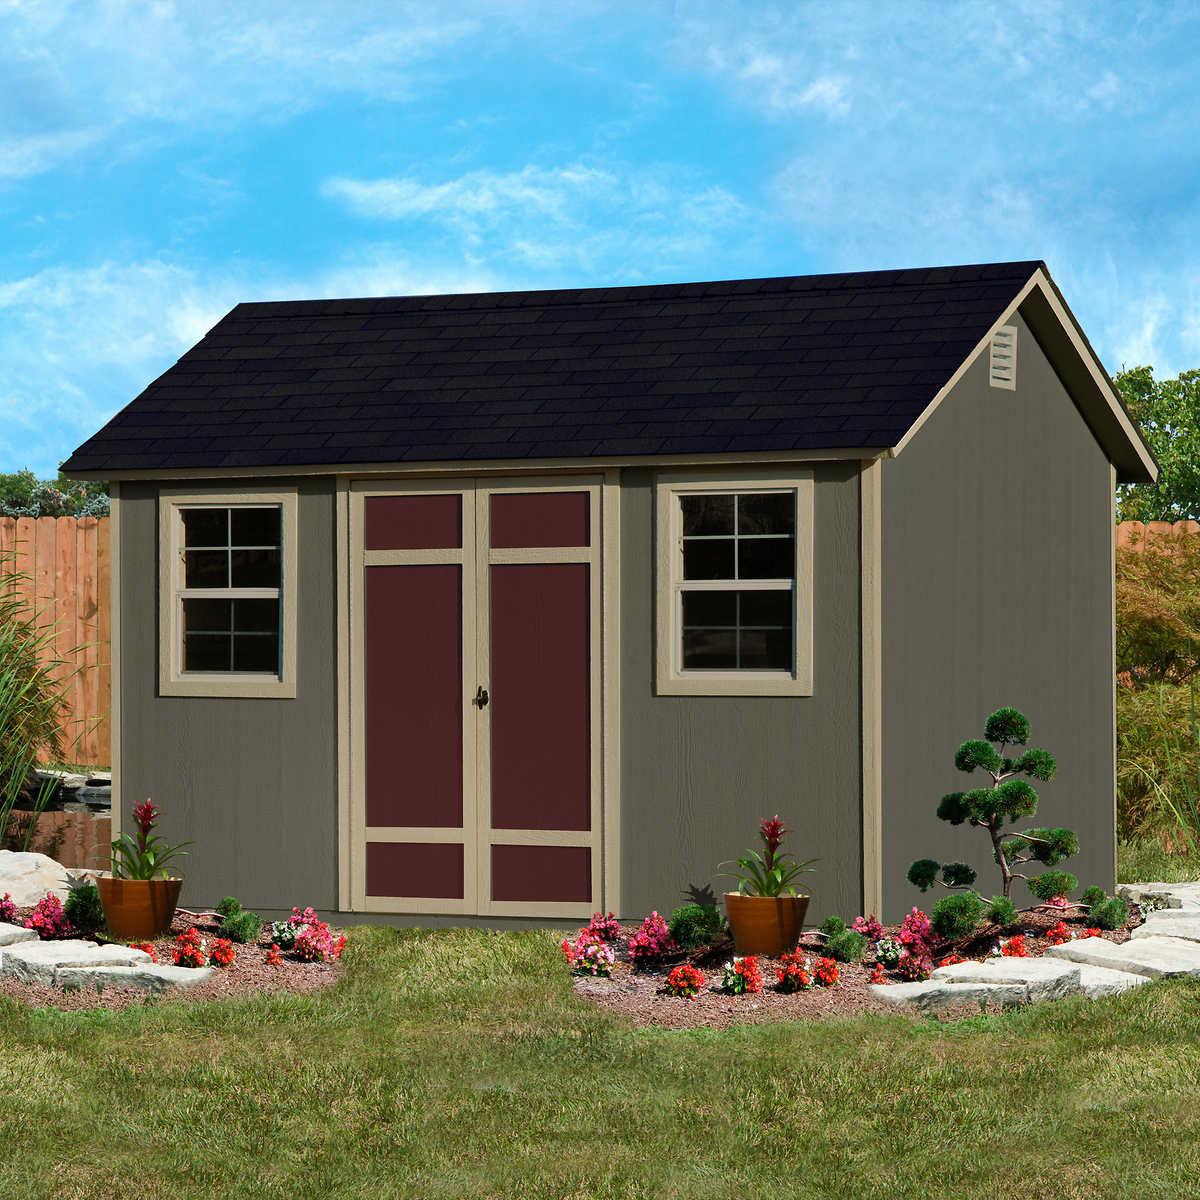 Wilmington 12 X 8 Wood Storage Shed Item 743495 Model 199151 0 1